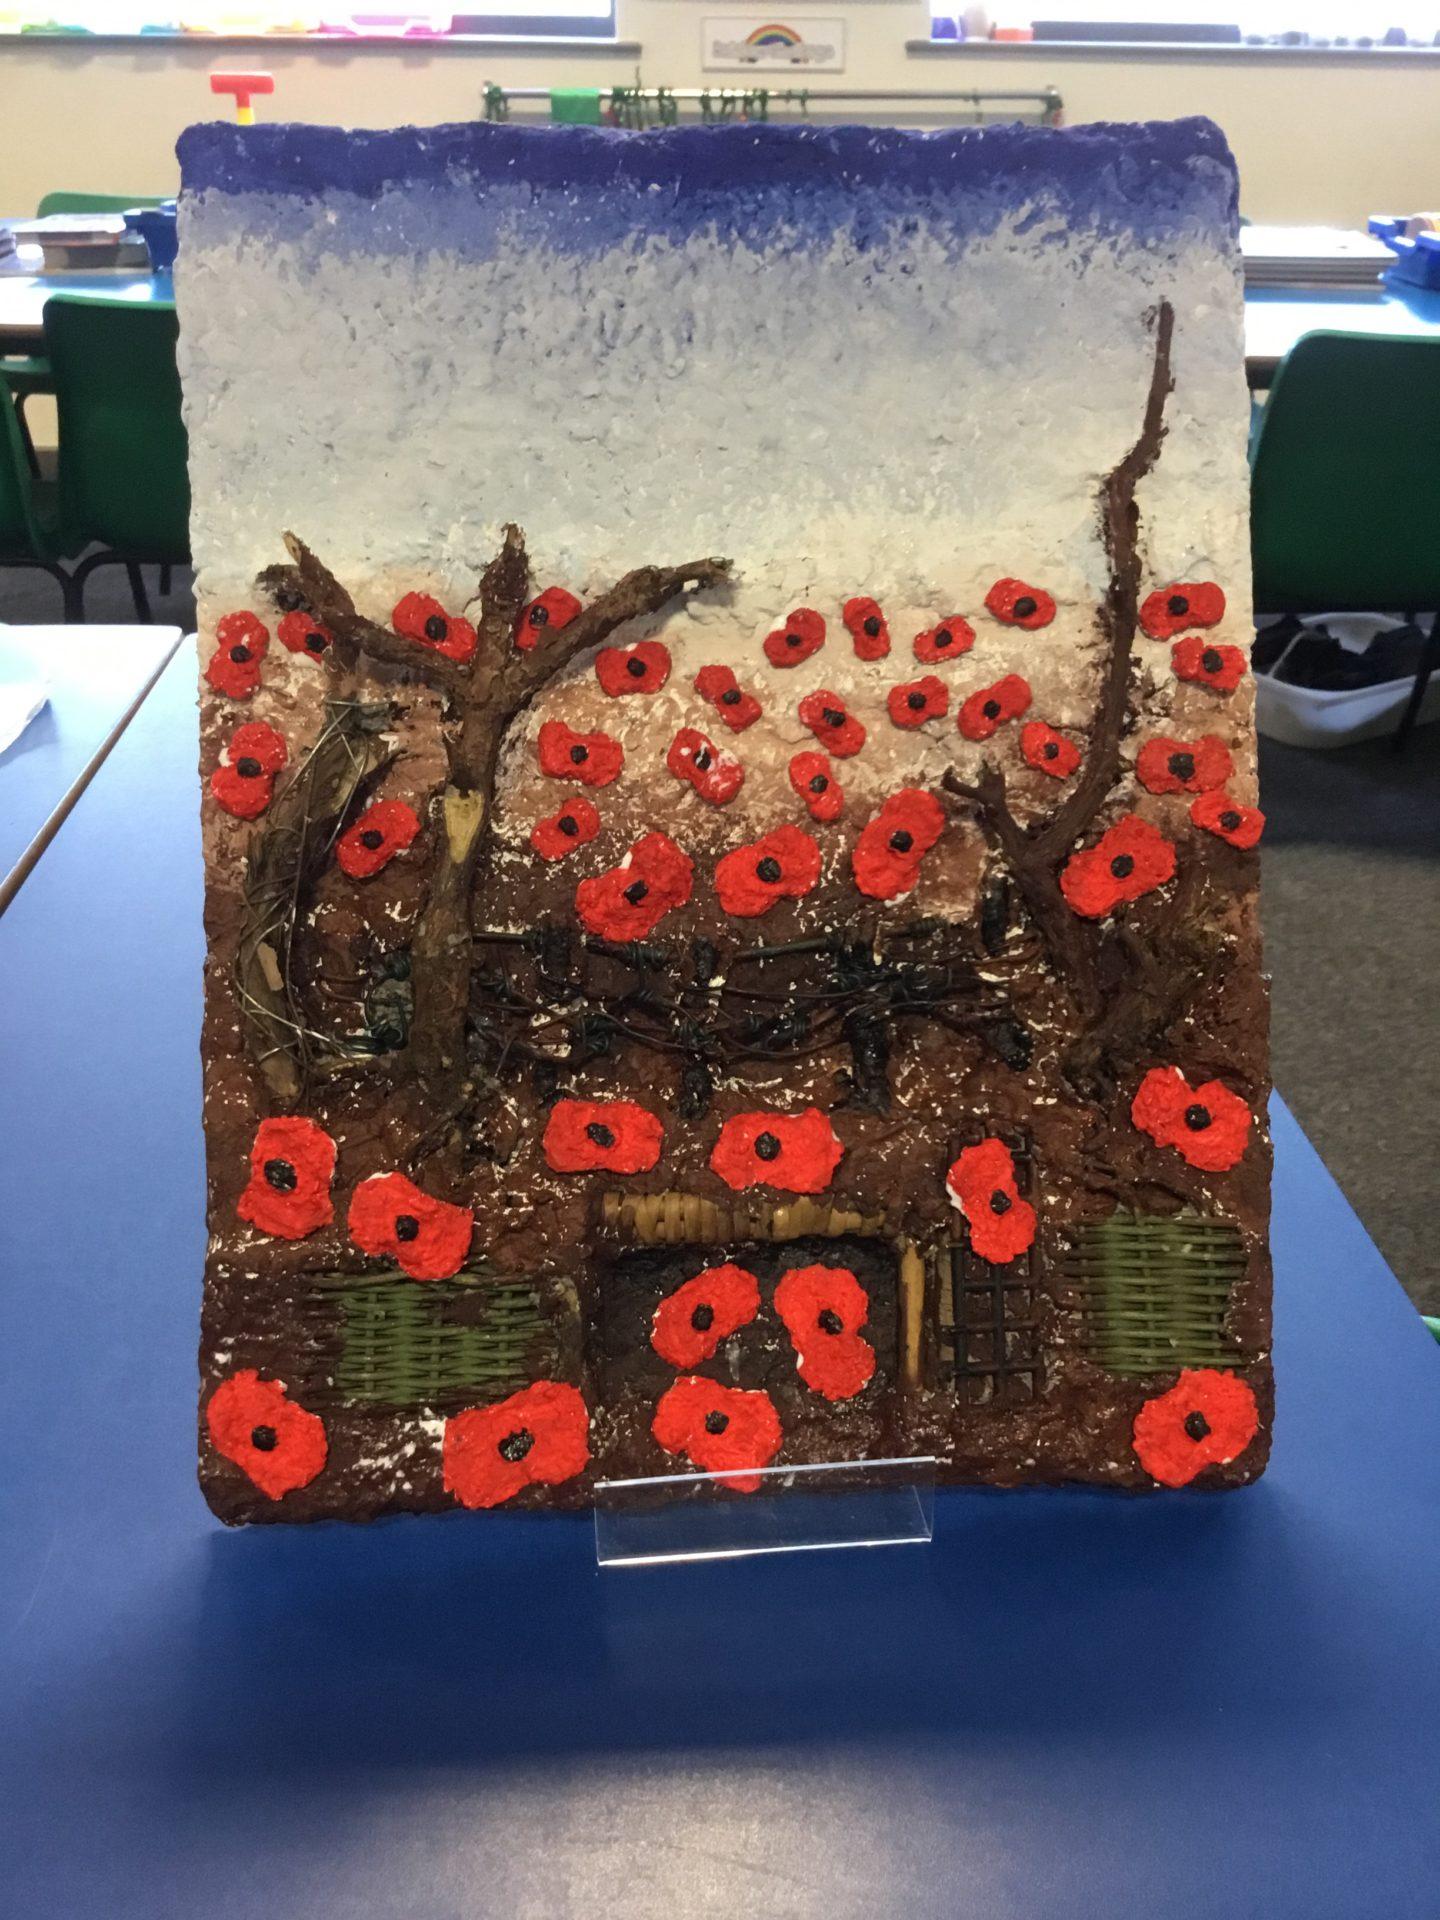 Poppy Art at The Grange Primary School